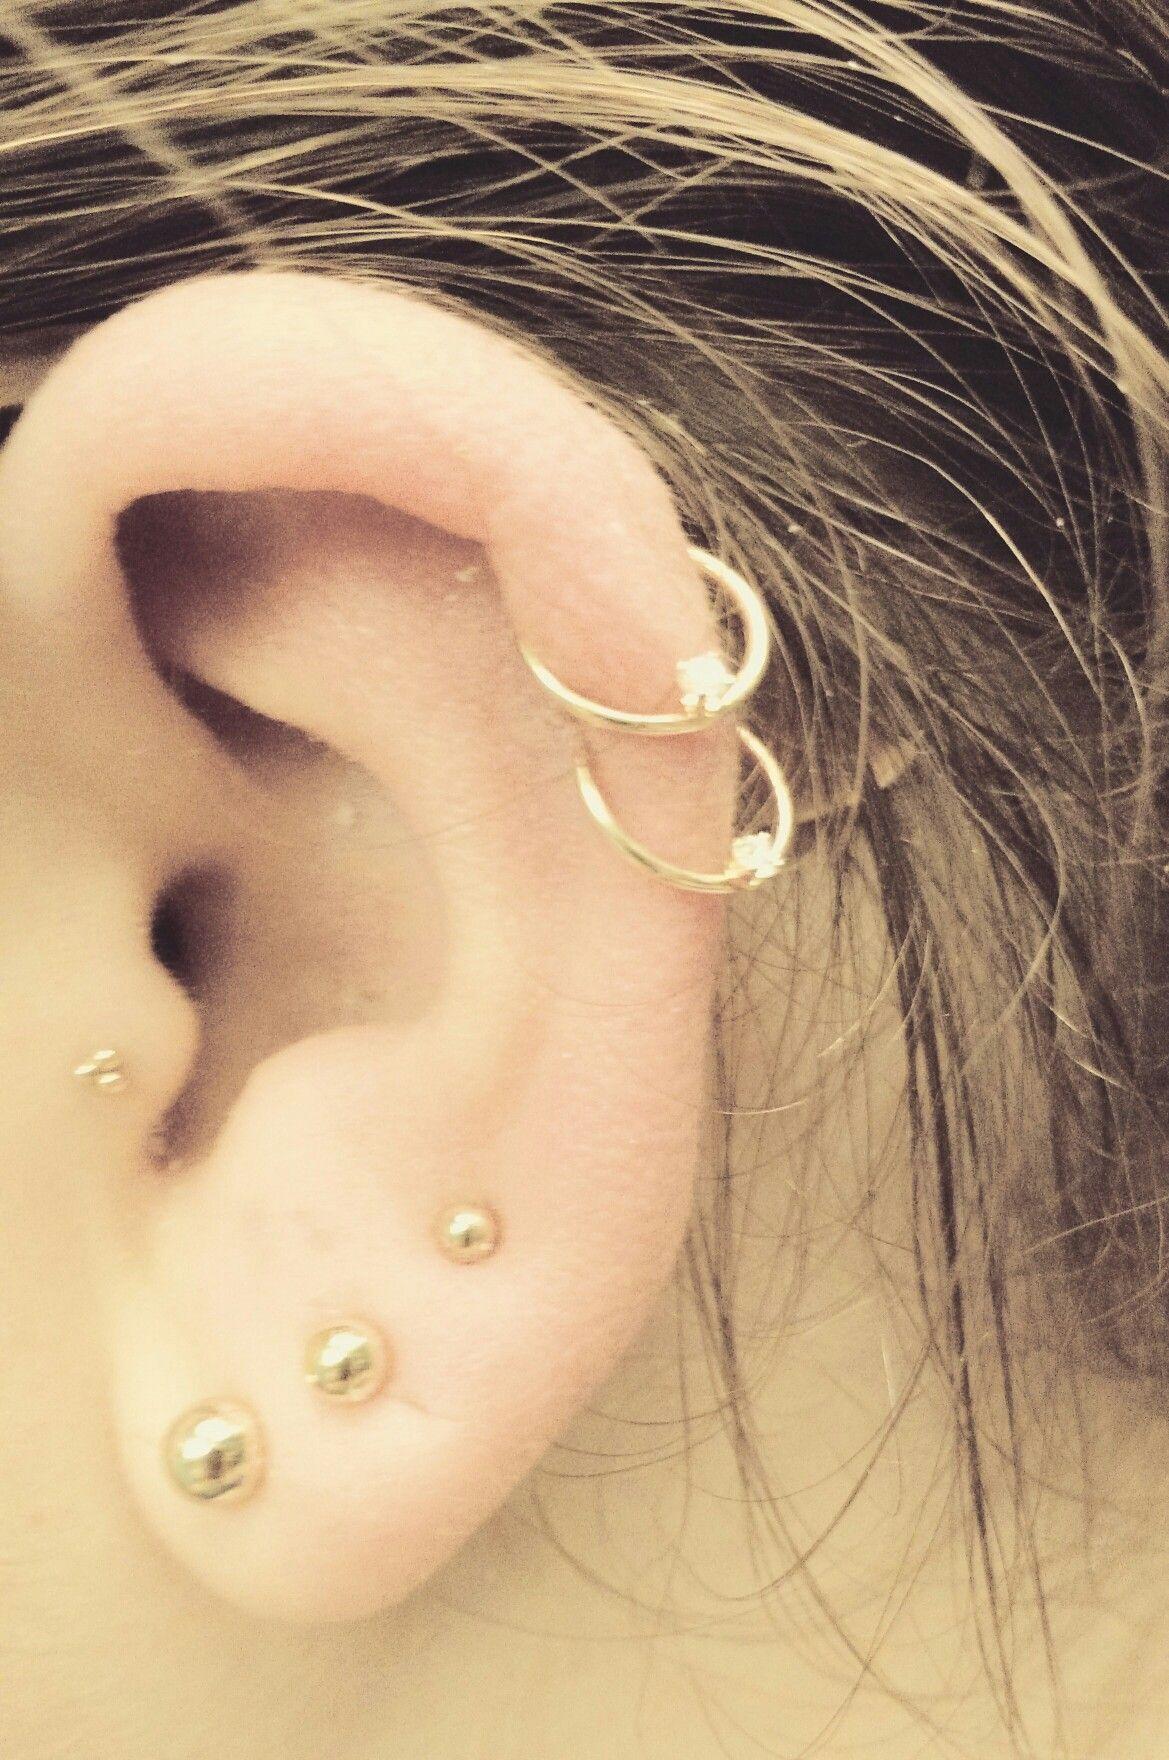 Double Helix Tragus 3 Lobe Gold Earrings Cartilage Fashion Multiple Piercings